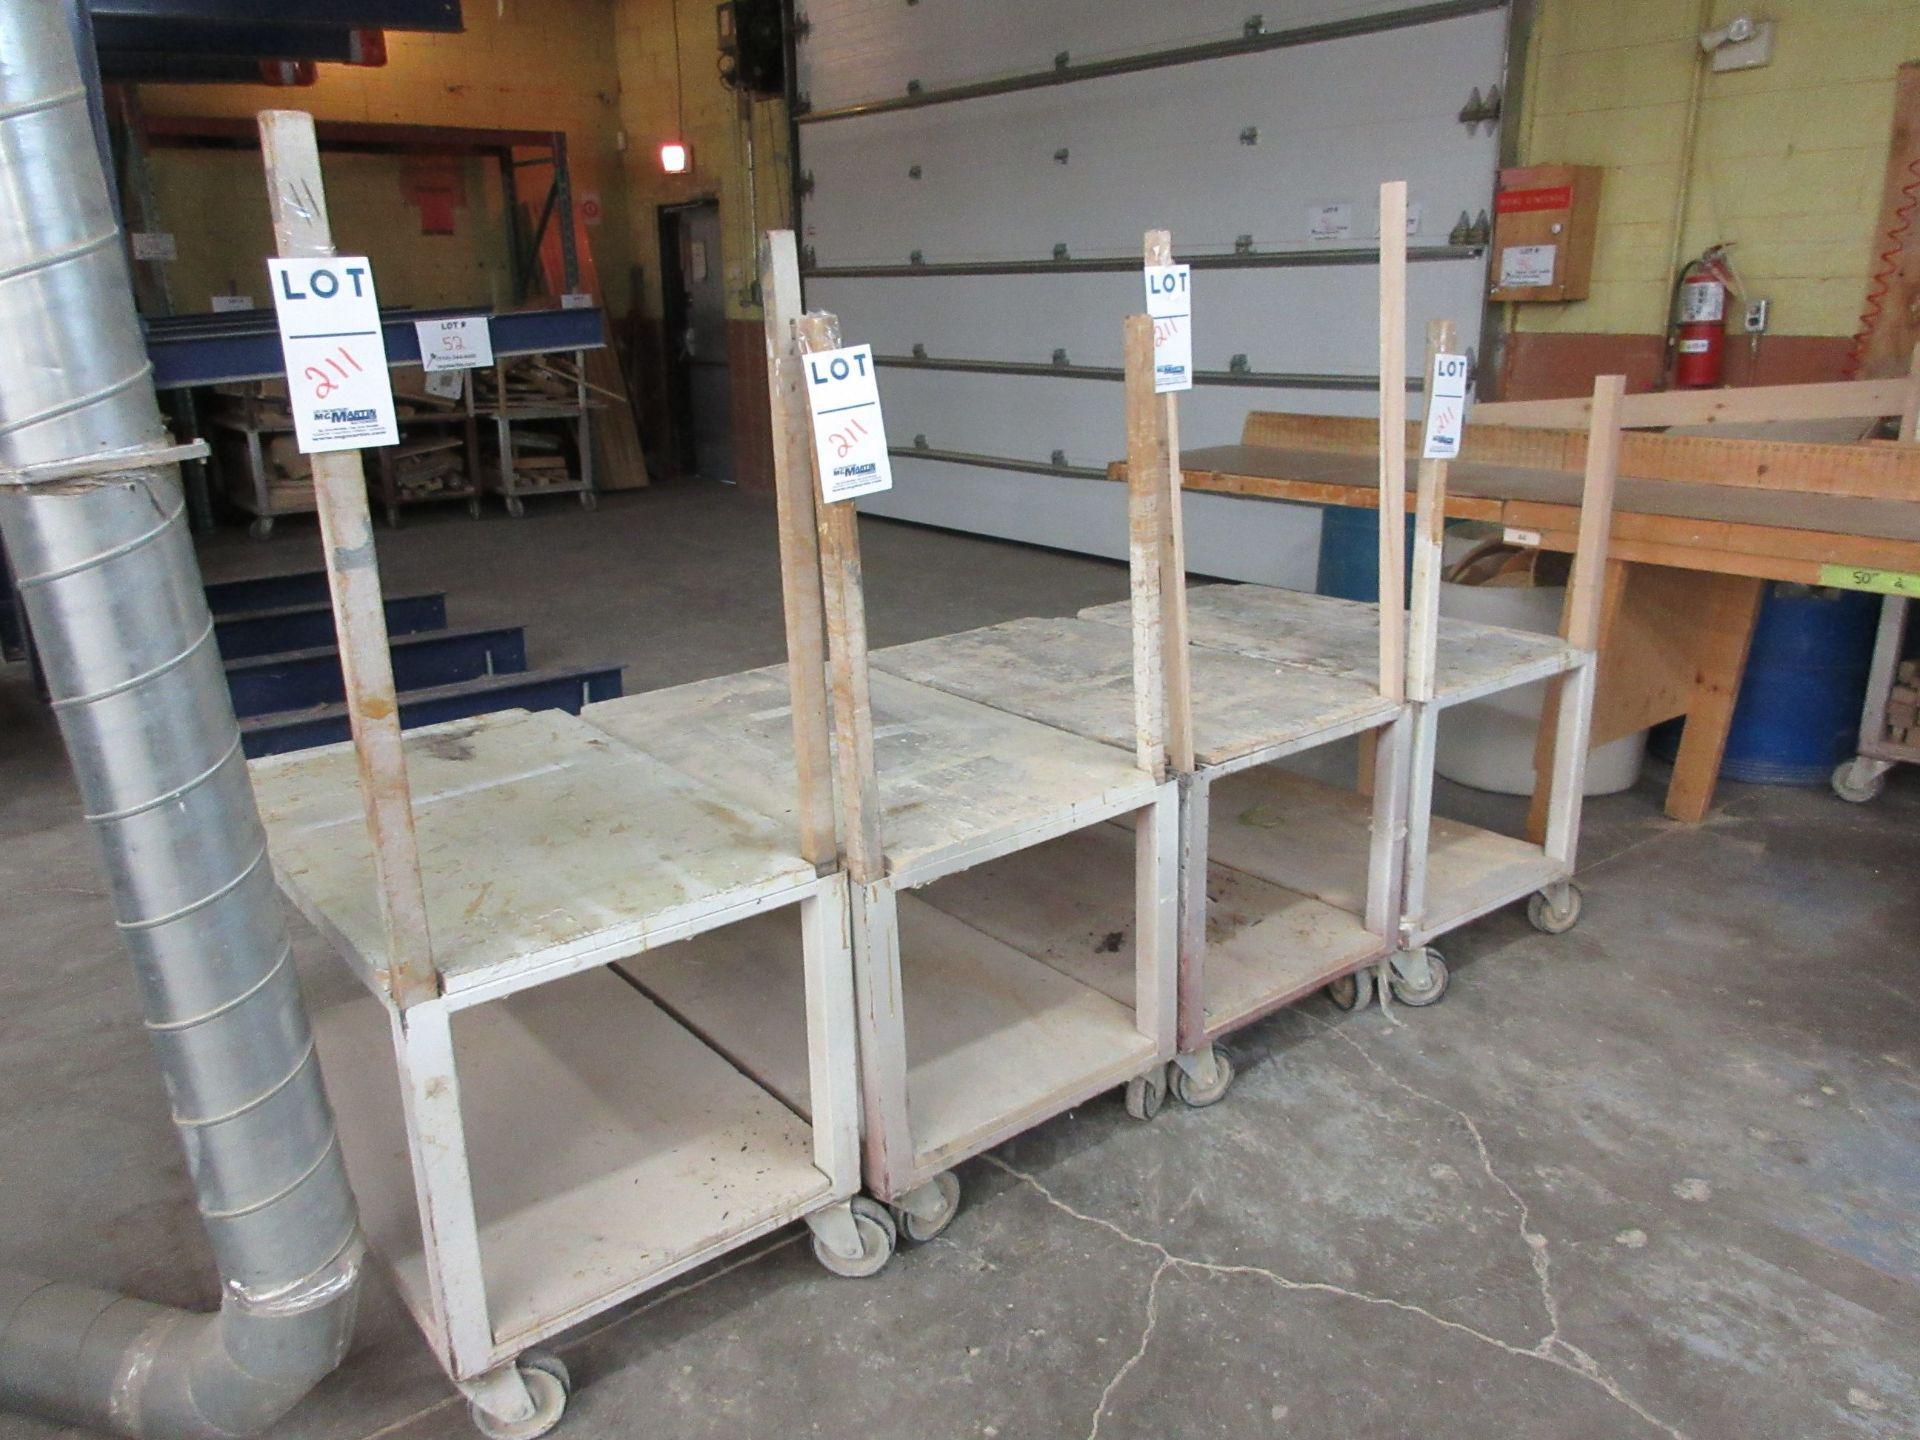 "Lot 211 - Work carts on wheels aprox 40"" x 24"" (4)"